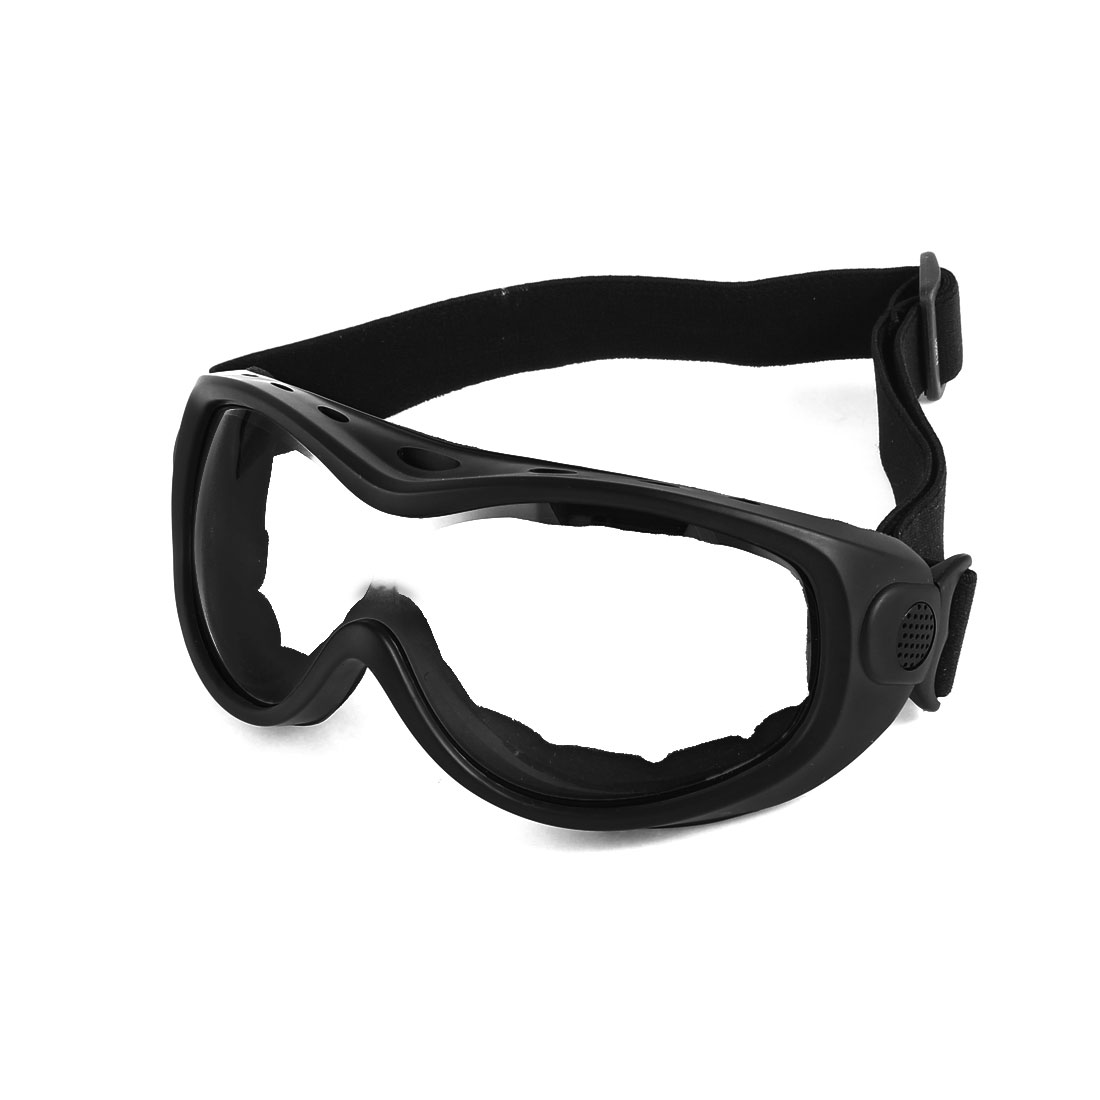 Ladies Men Stretchy Band Airflow Lens Ventilation Sports Ski Snowboard Goggles